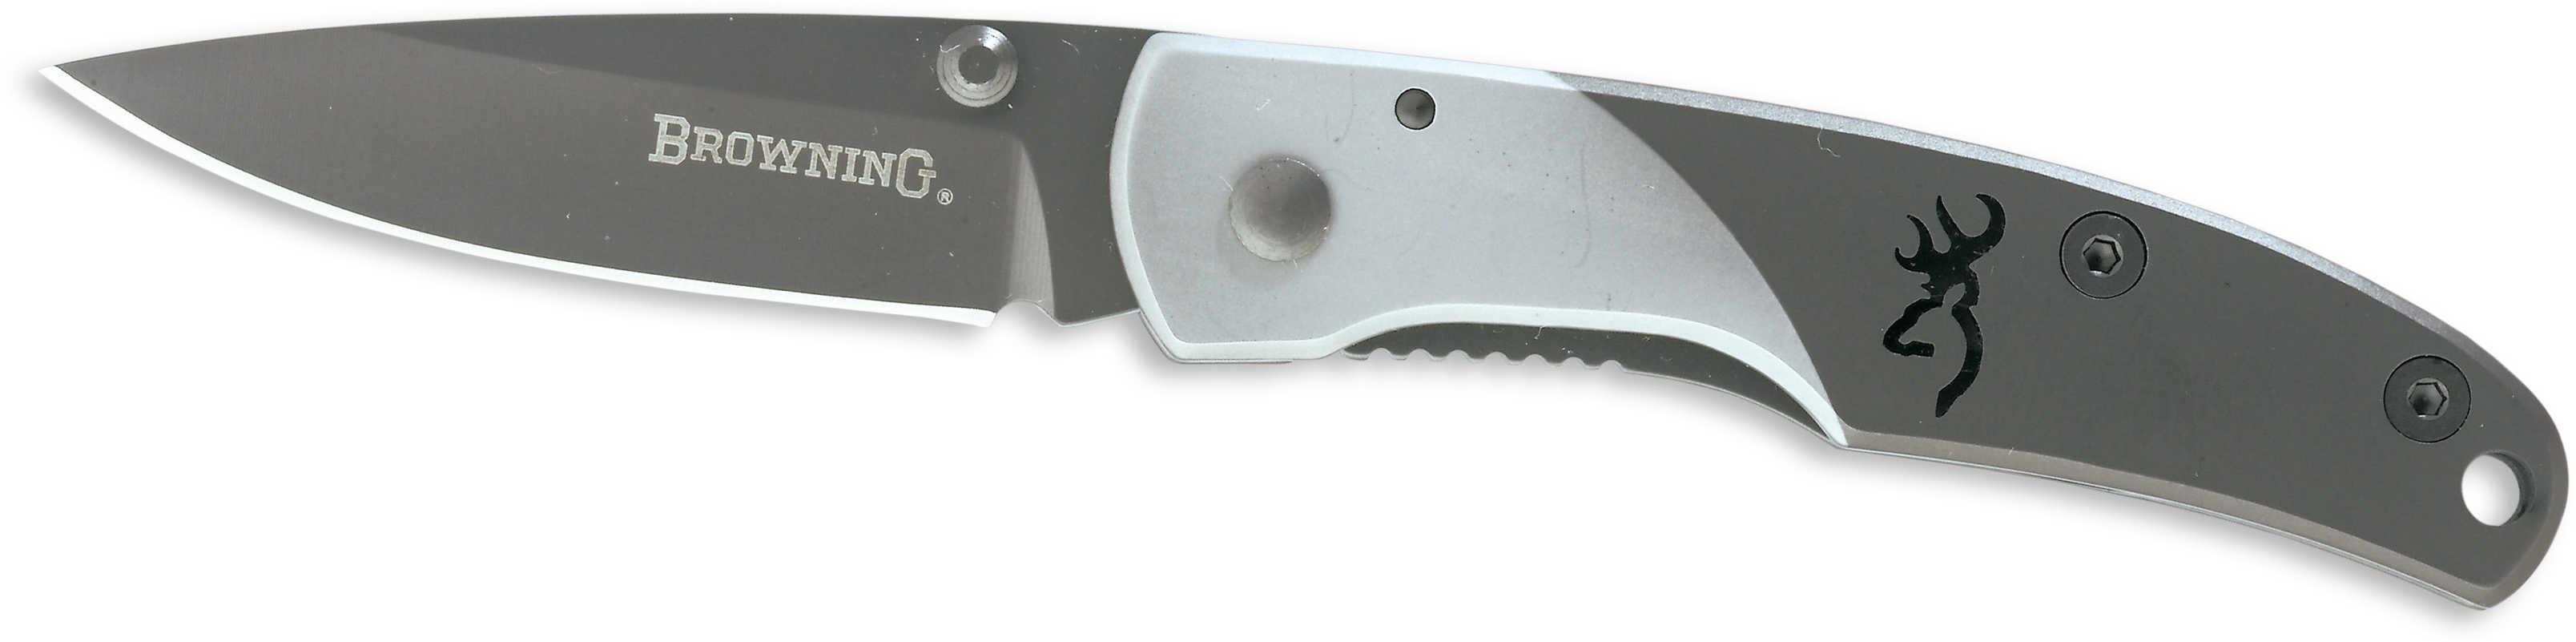 Browning Mountain Ti Folding Knife Small, Box Md: 322561B